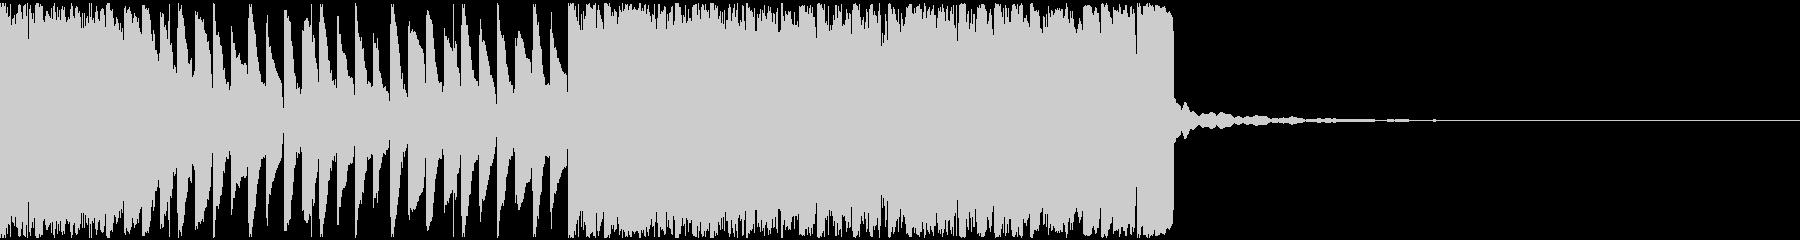 【EDM】約20秒、ジングル2の未再生の波形